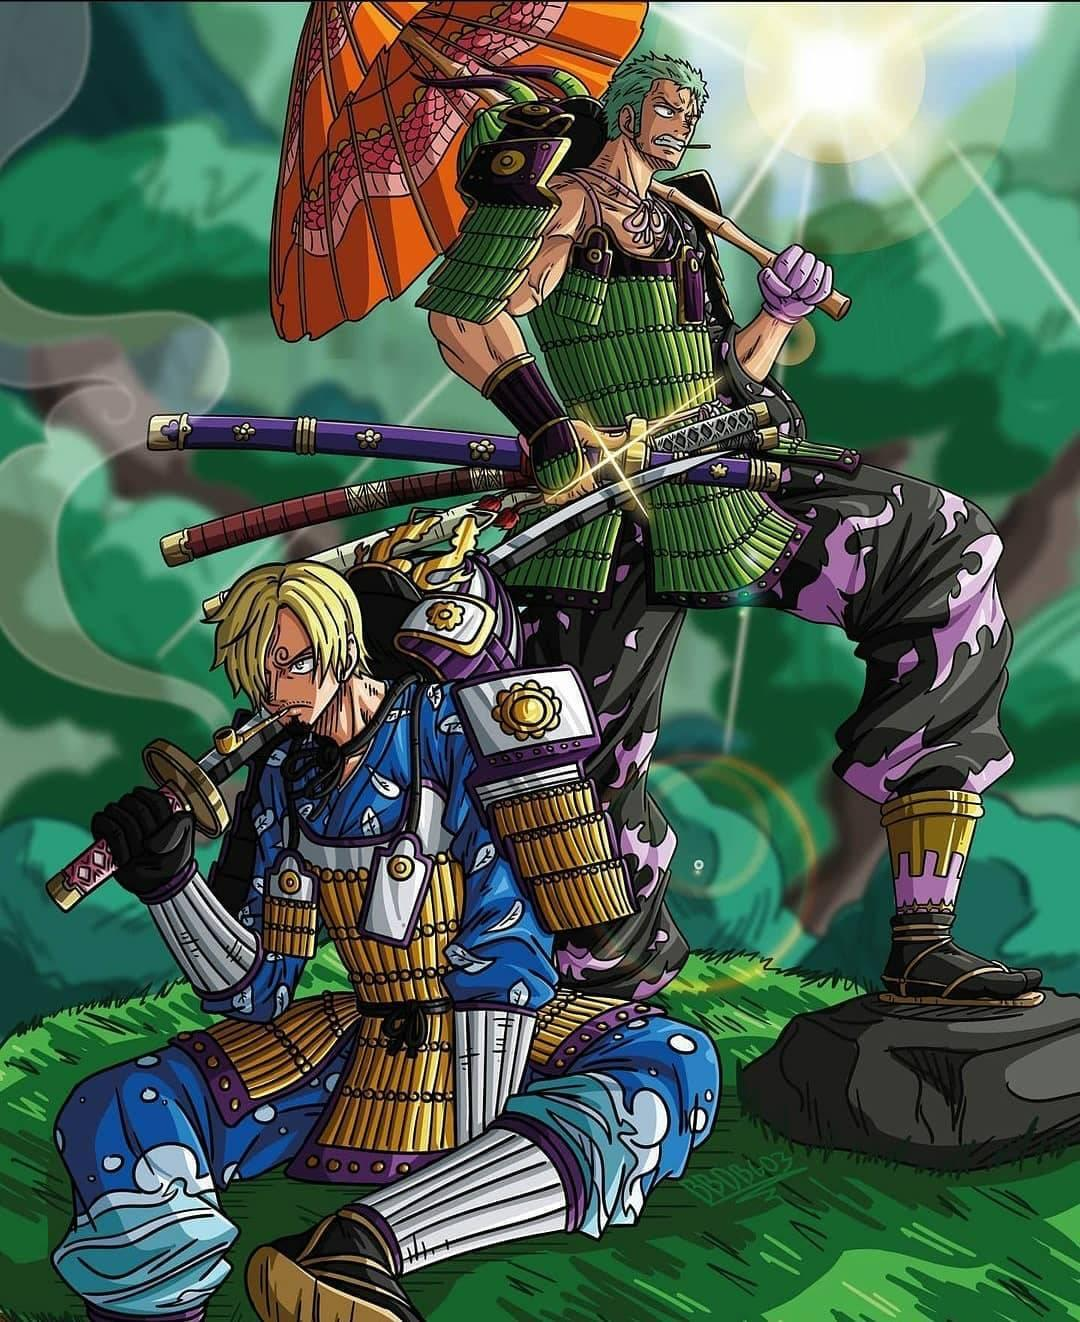 Wallpaper Anime Hd Terbaru Wallpaper Hd